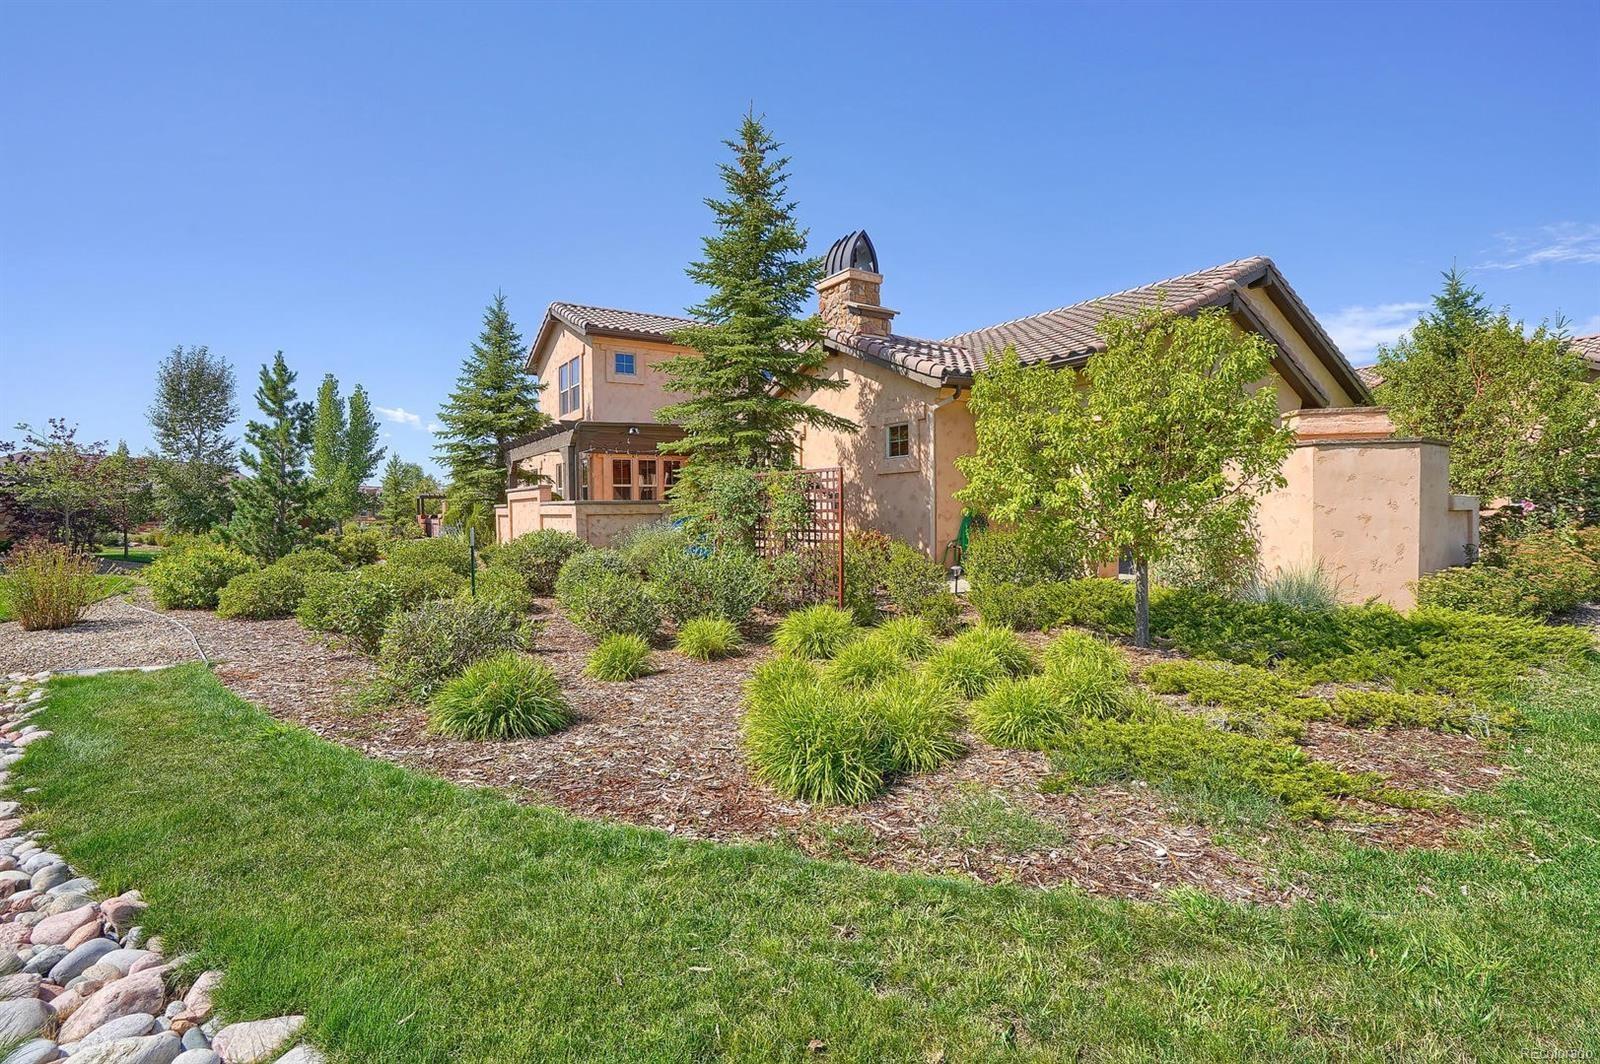 MLS# 7383029 - 4 - 2276 Rocking Horse Court, Colorado Springs, CO 80921